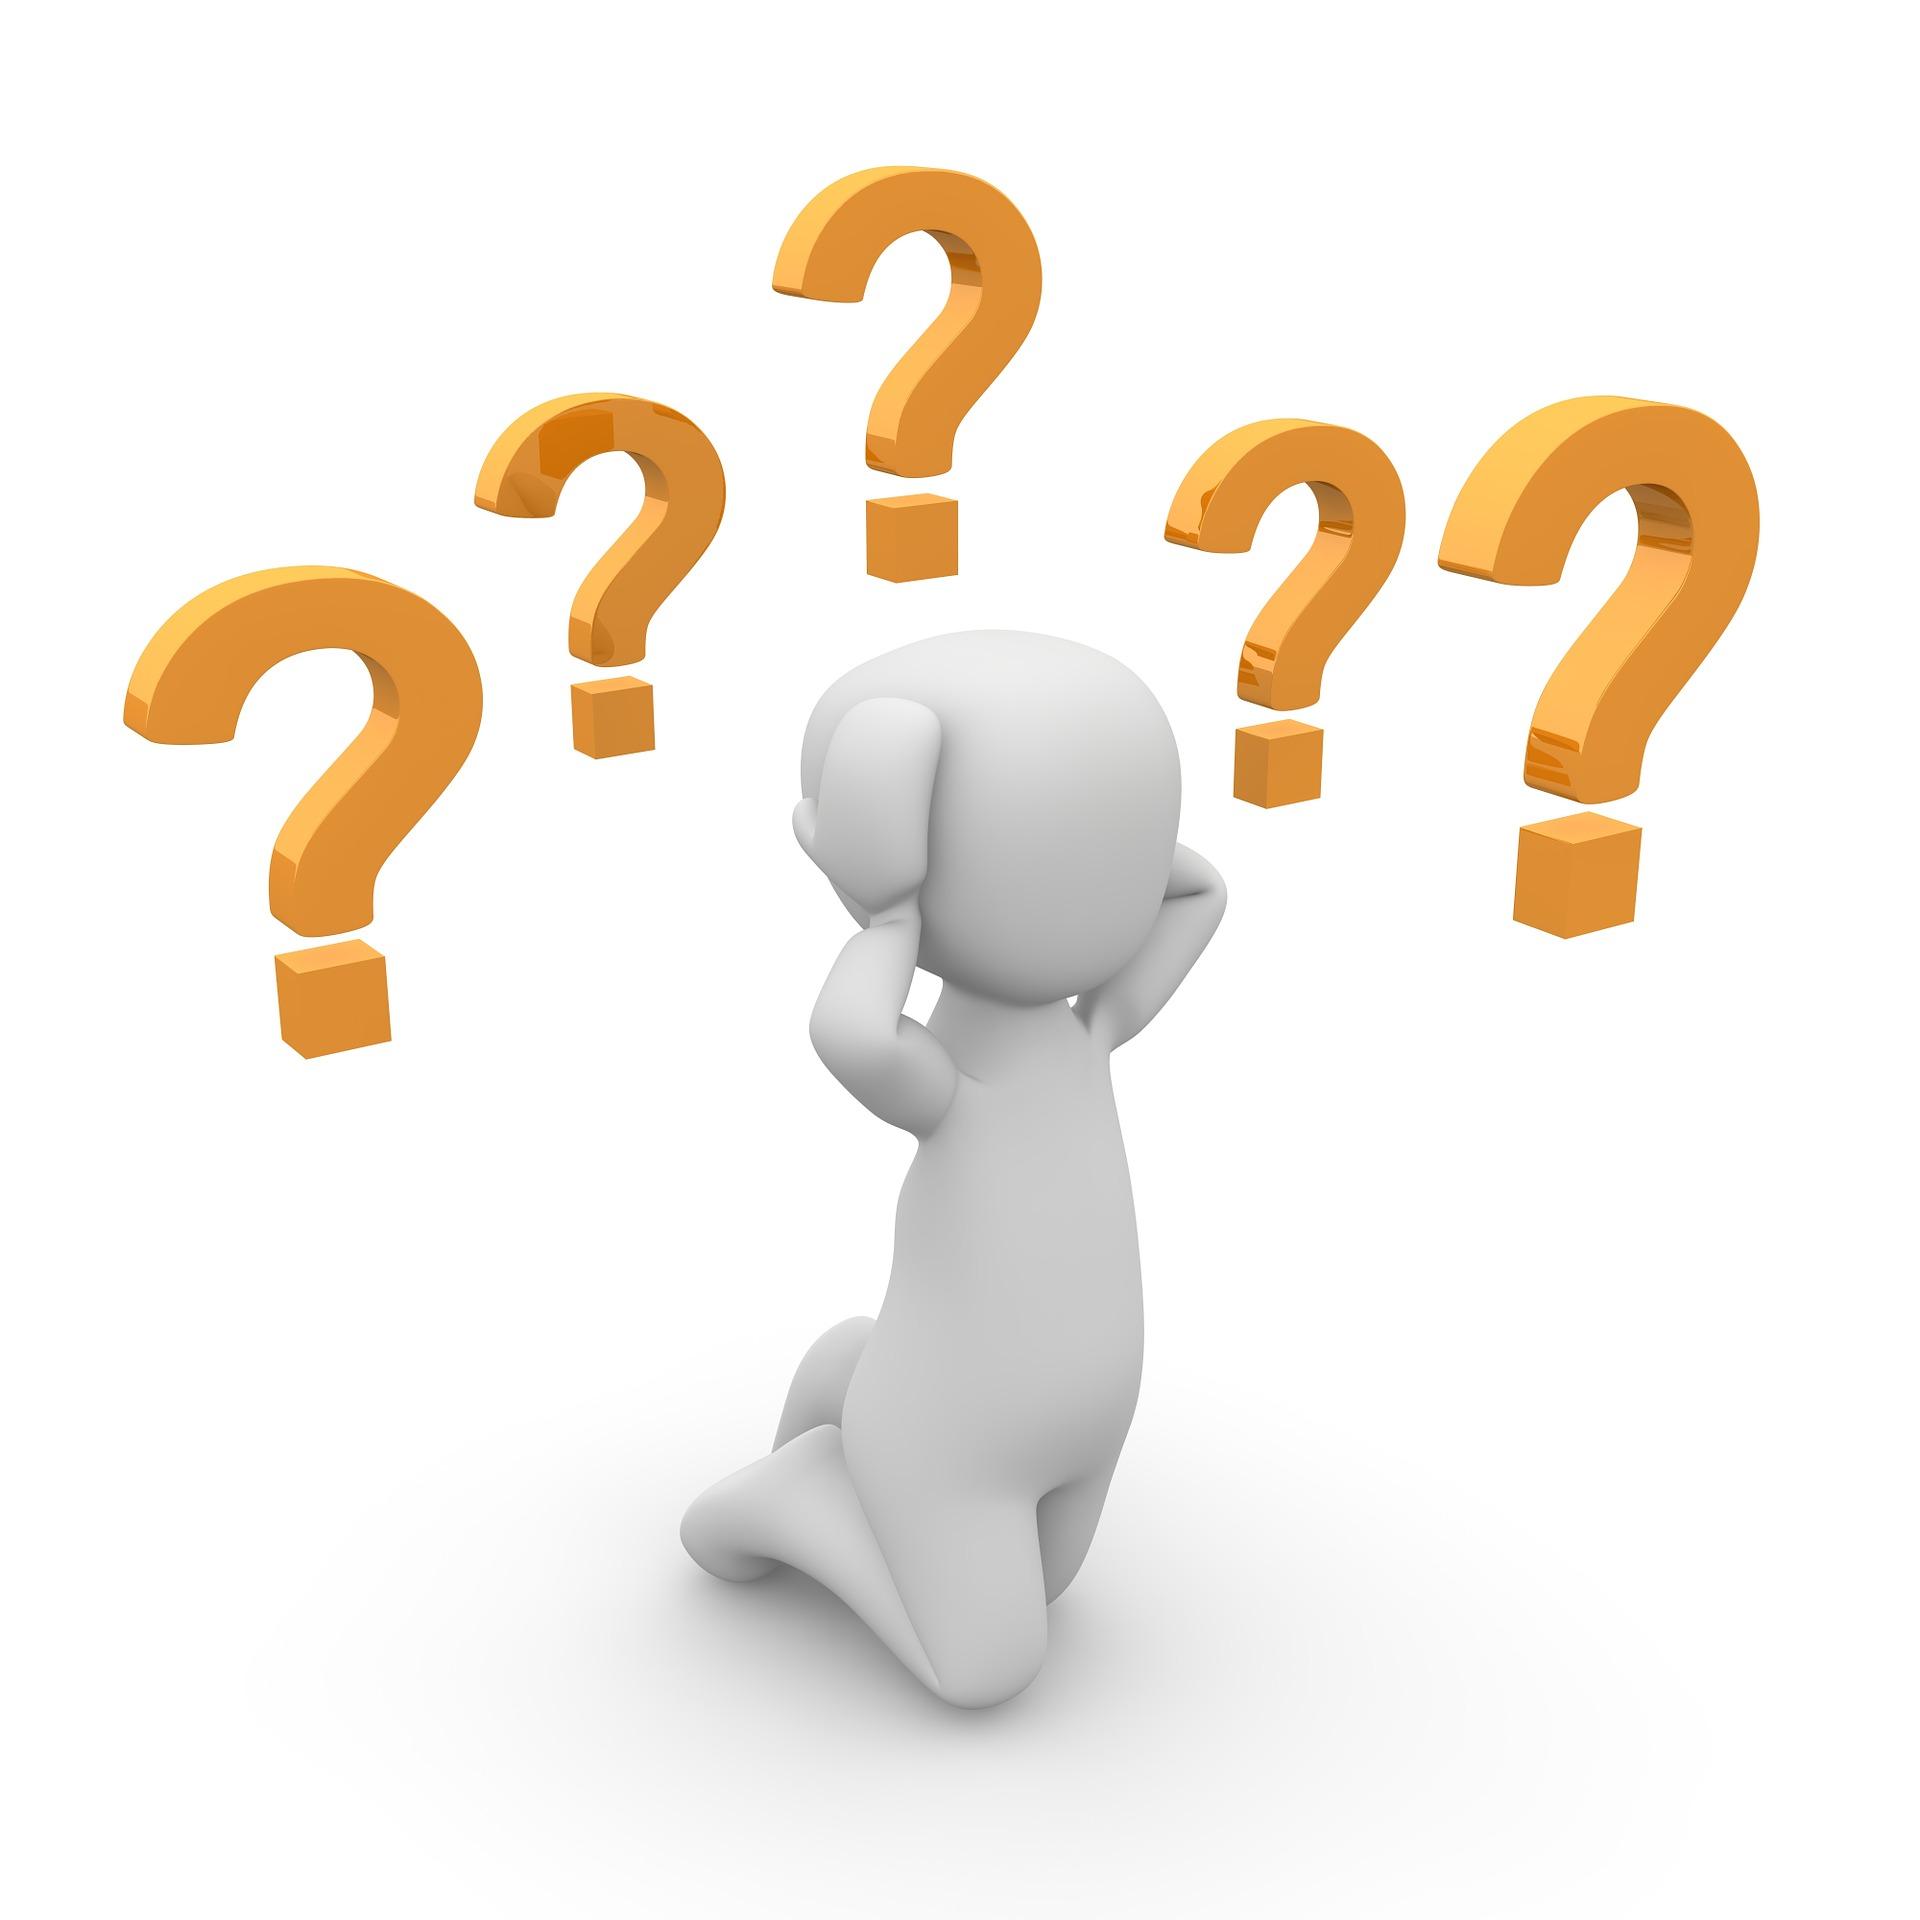 Du hast Fragen zum HOLI-Festival?